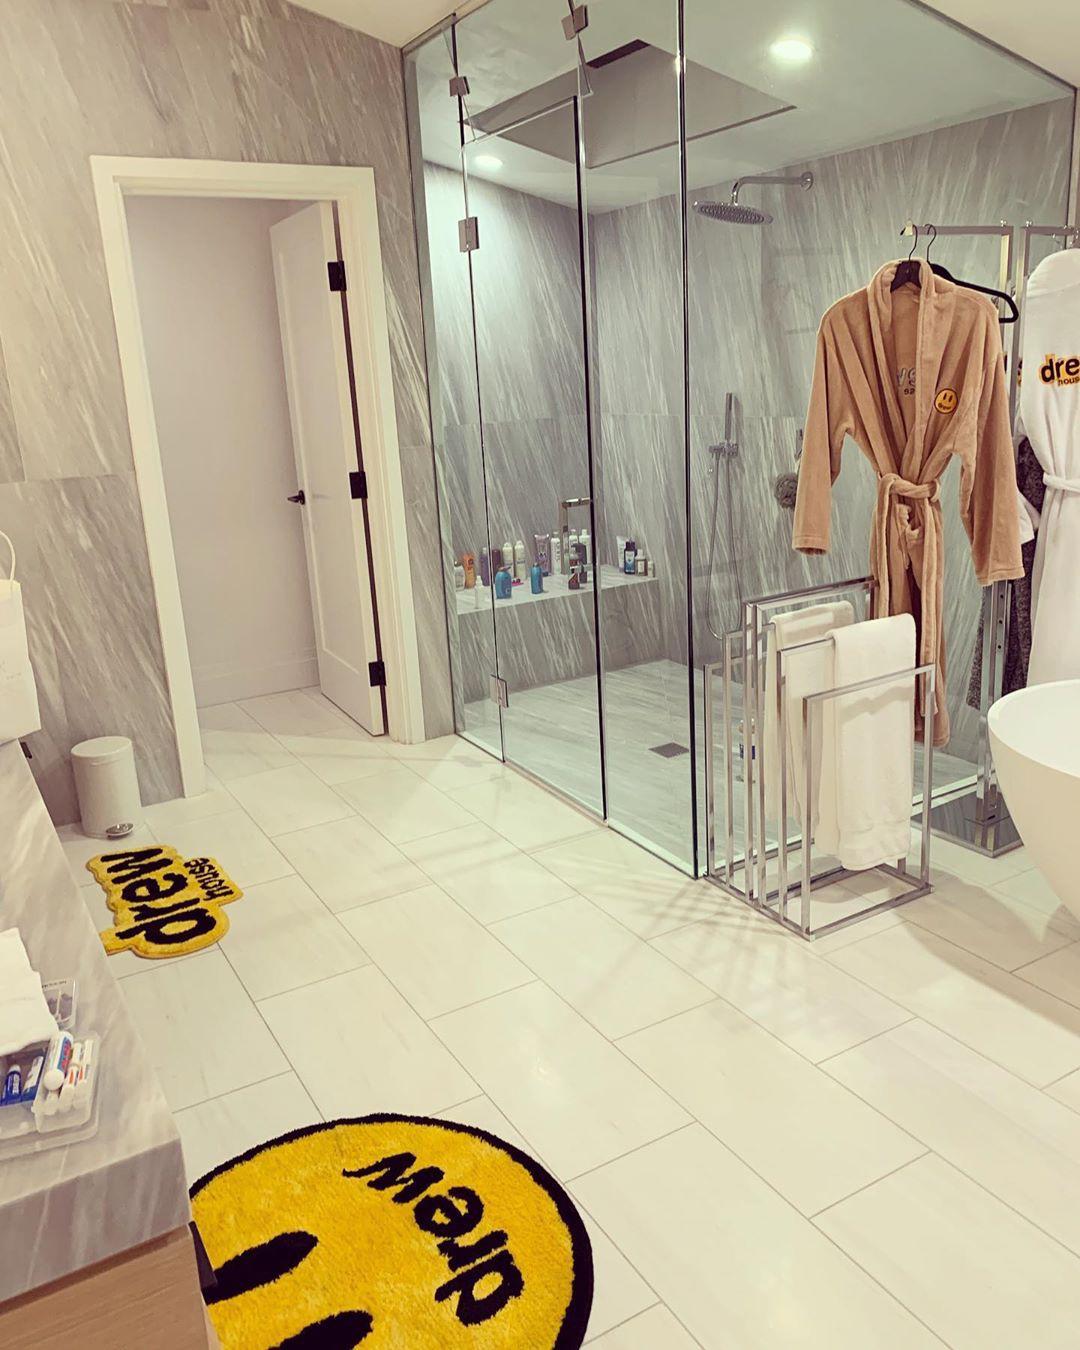 Justin Bieber's bathroom